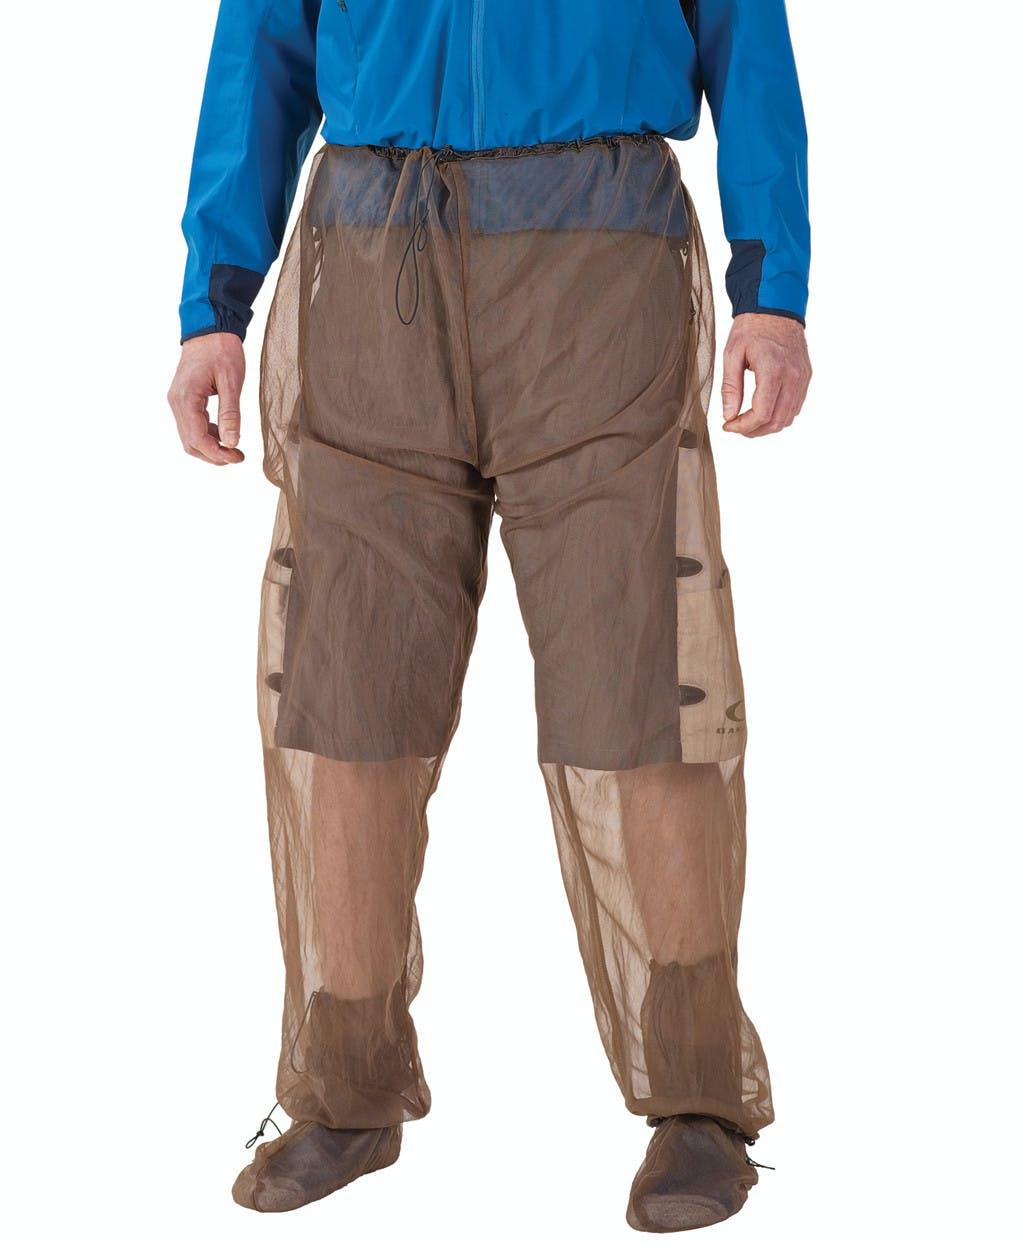 sea to summit - Bug Pants Socks   XL - X-Large